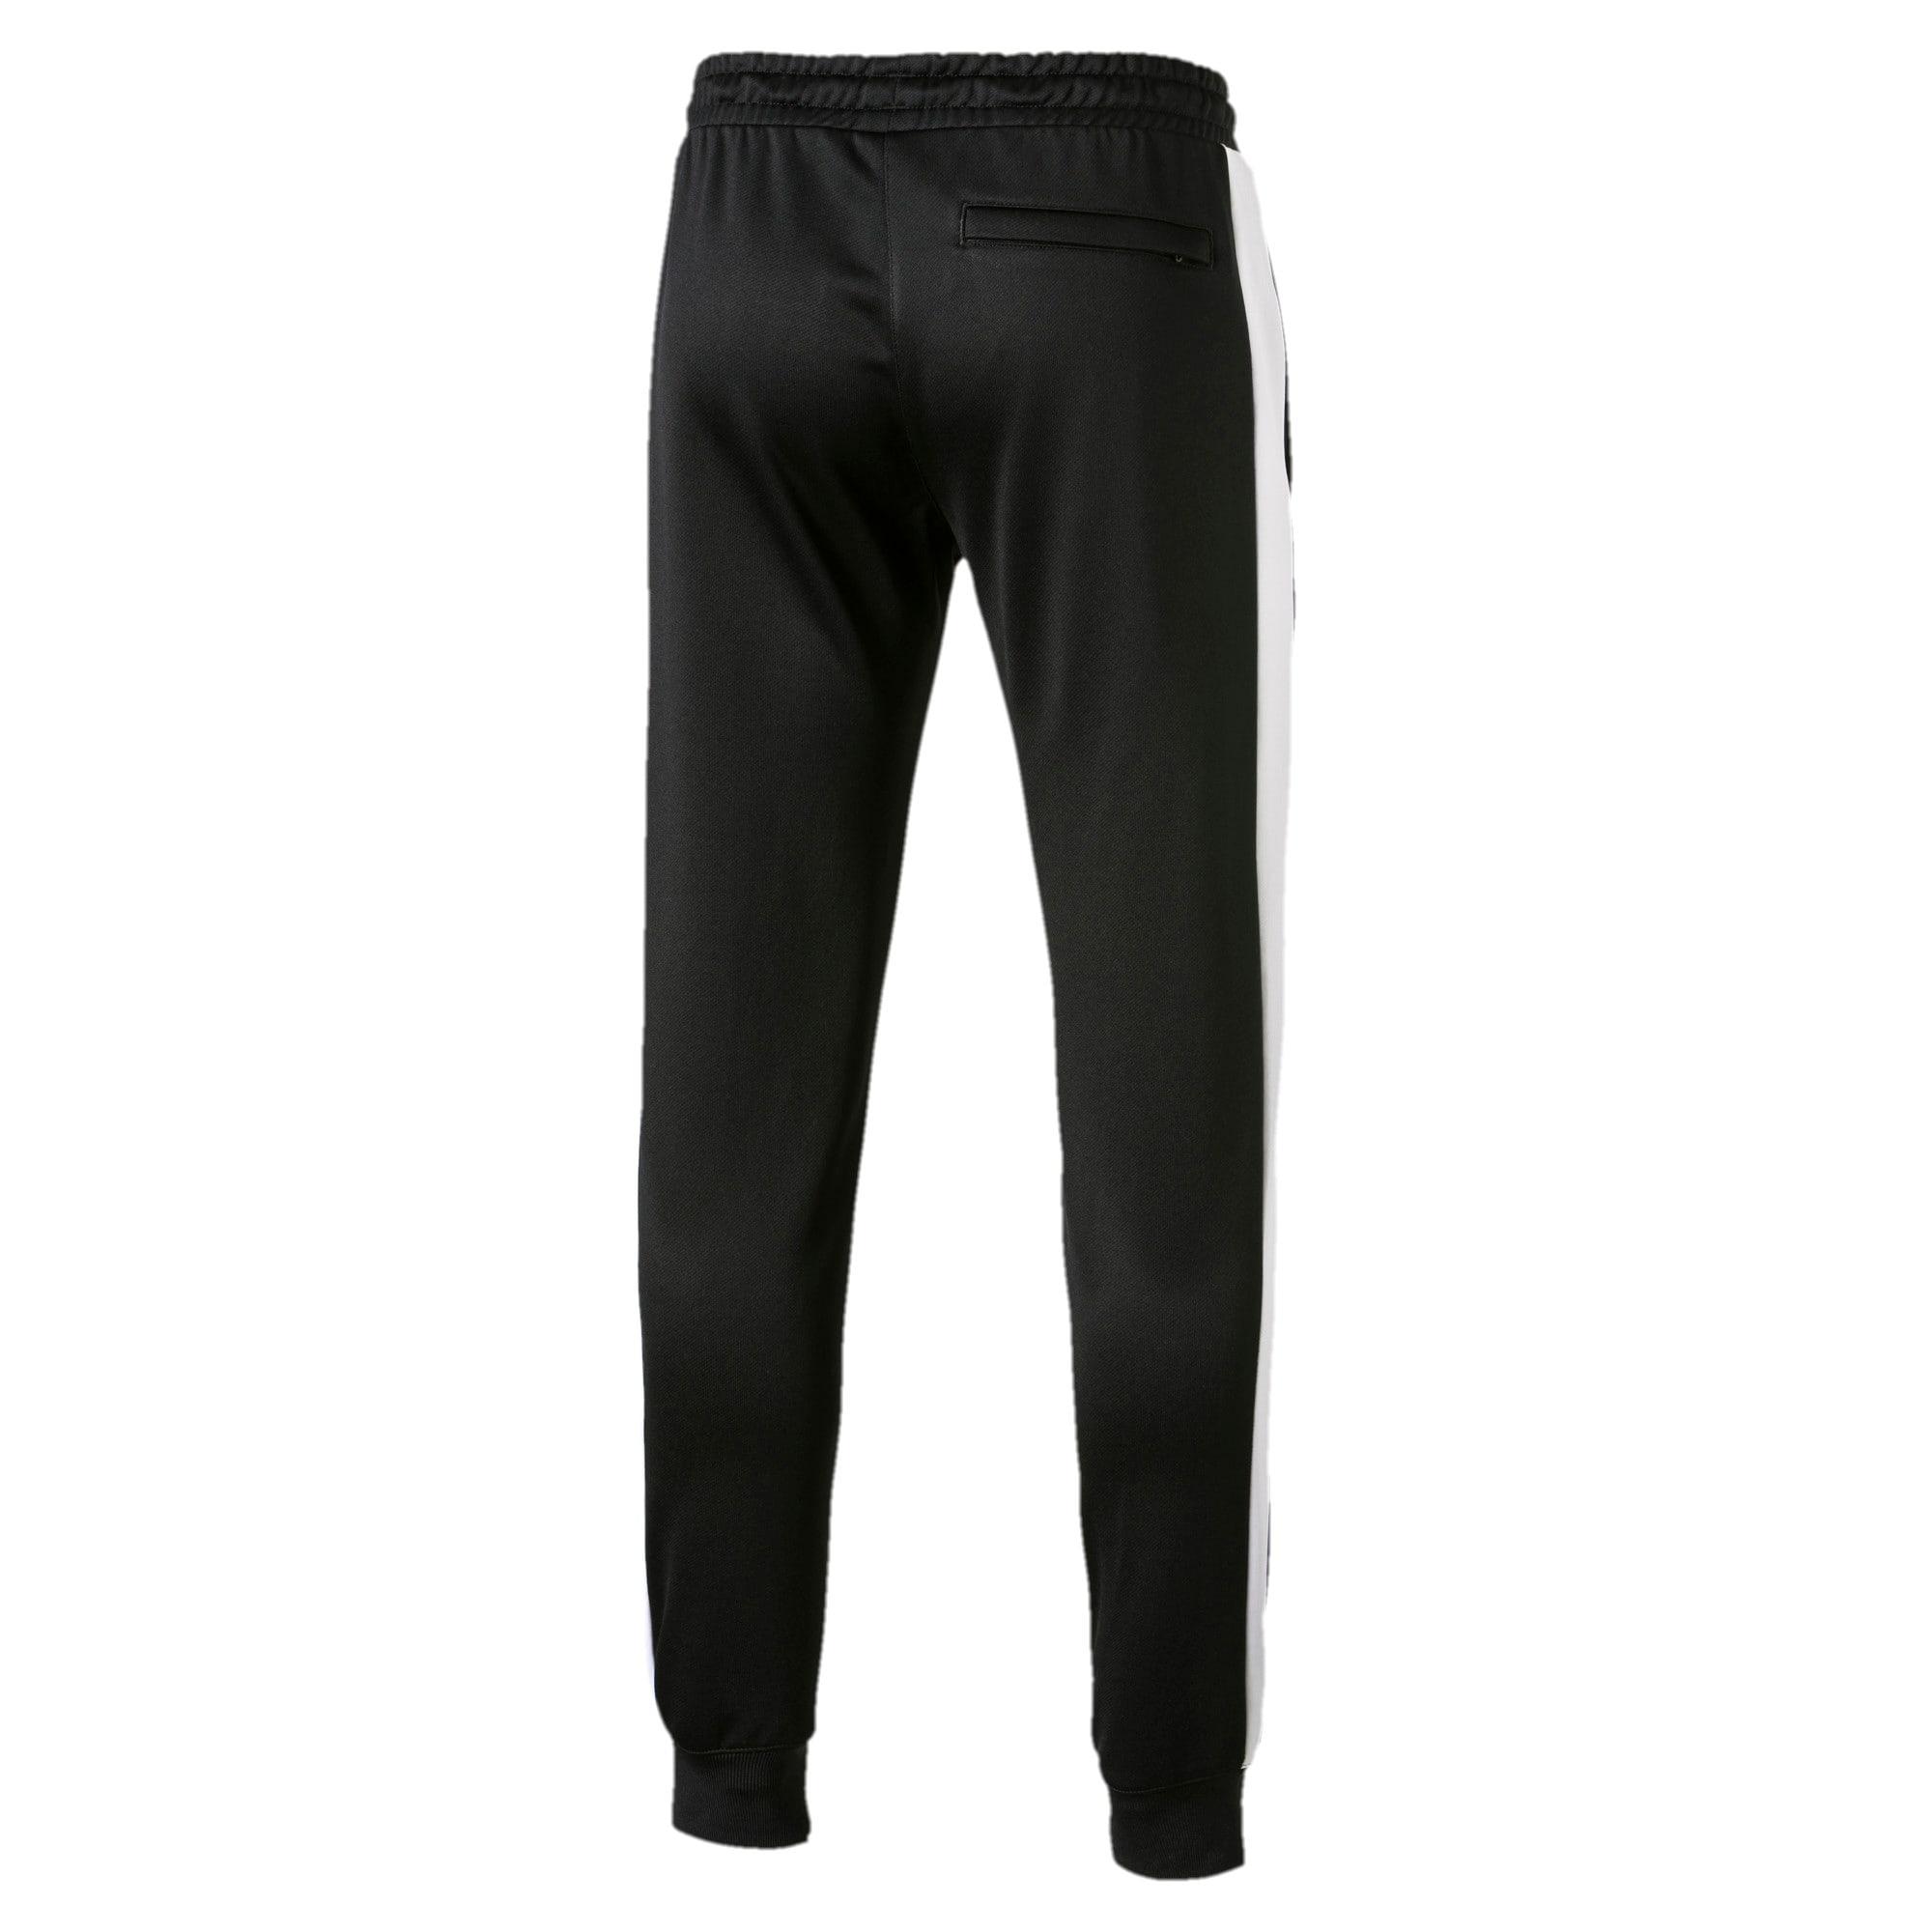 Thumbnail 5 of Iconic T7 Herren Gestrickte Sweatpants, Puma Black, medium